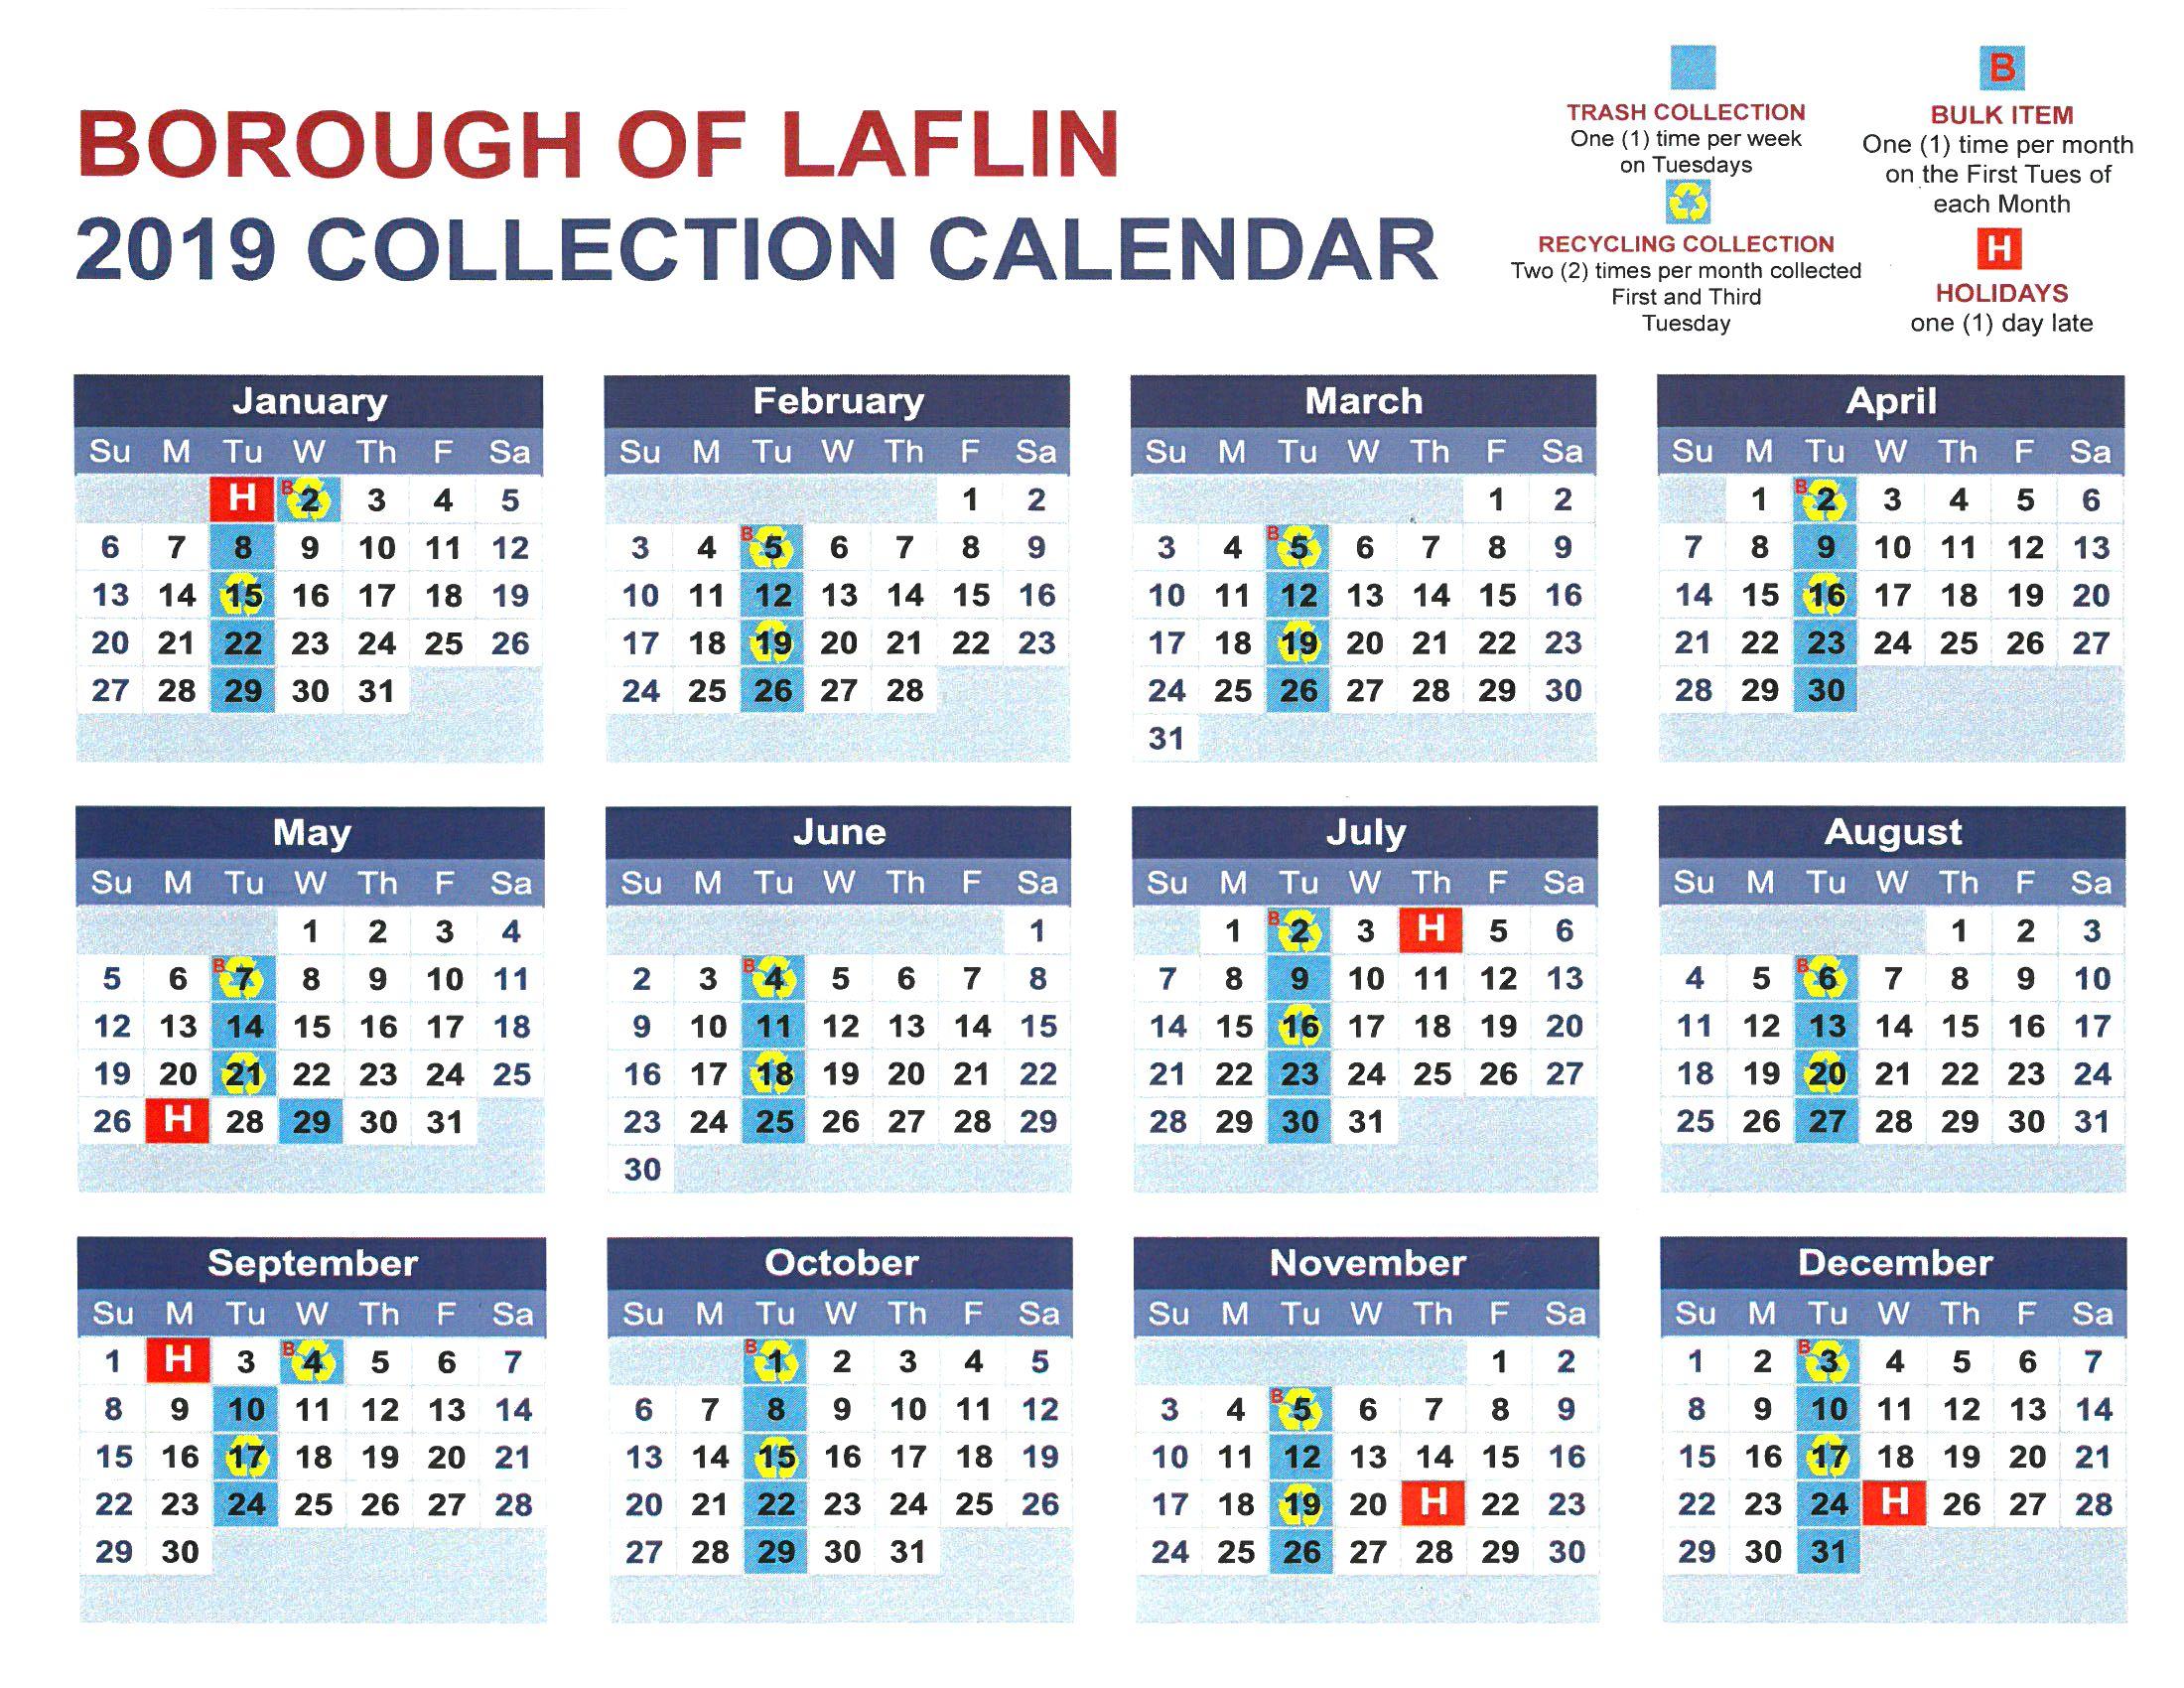 Home | 47 Laflin Rd Laflin Pa 18702 – 570-654-3323 – Email